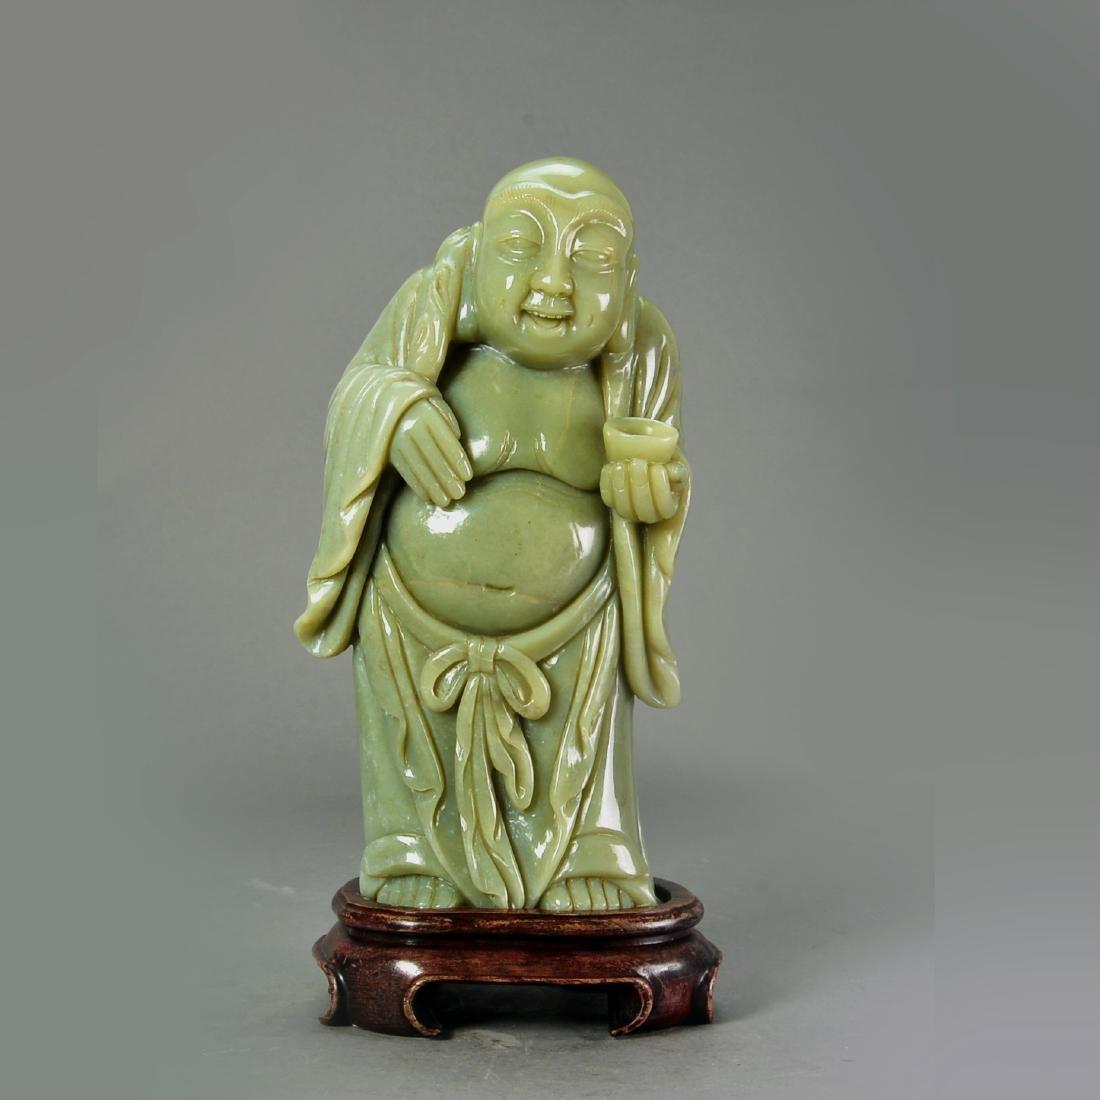 Chinese Old Jade of Buddha Figure